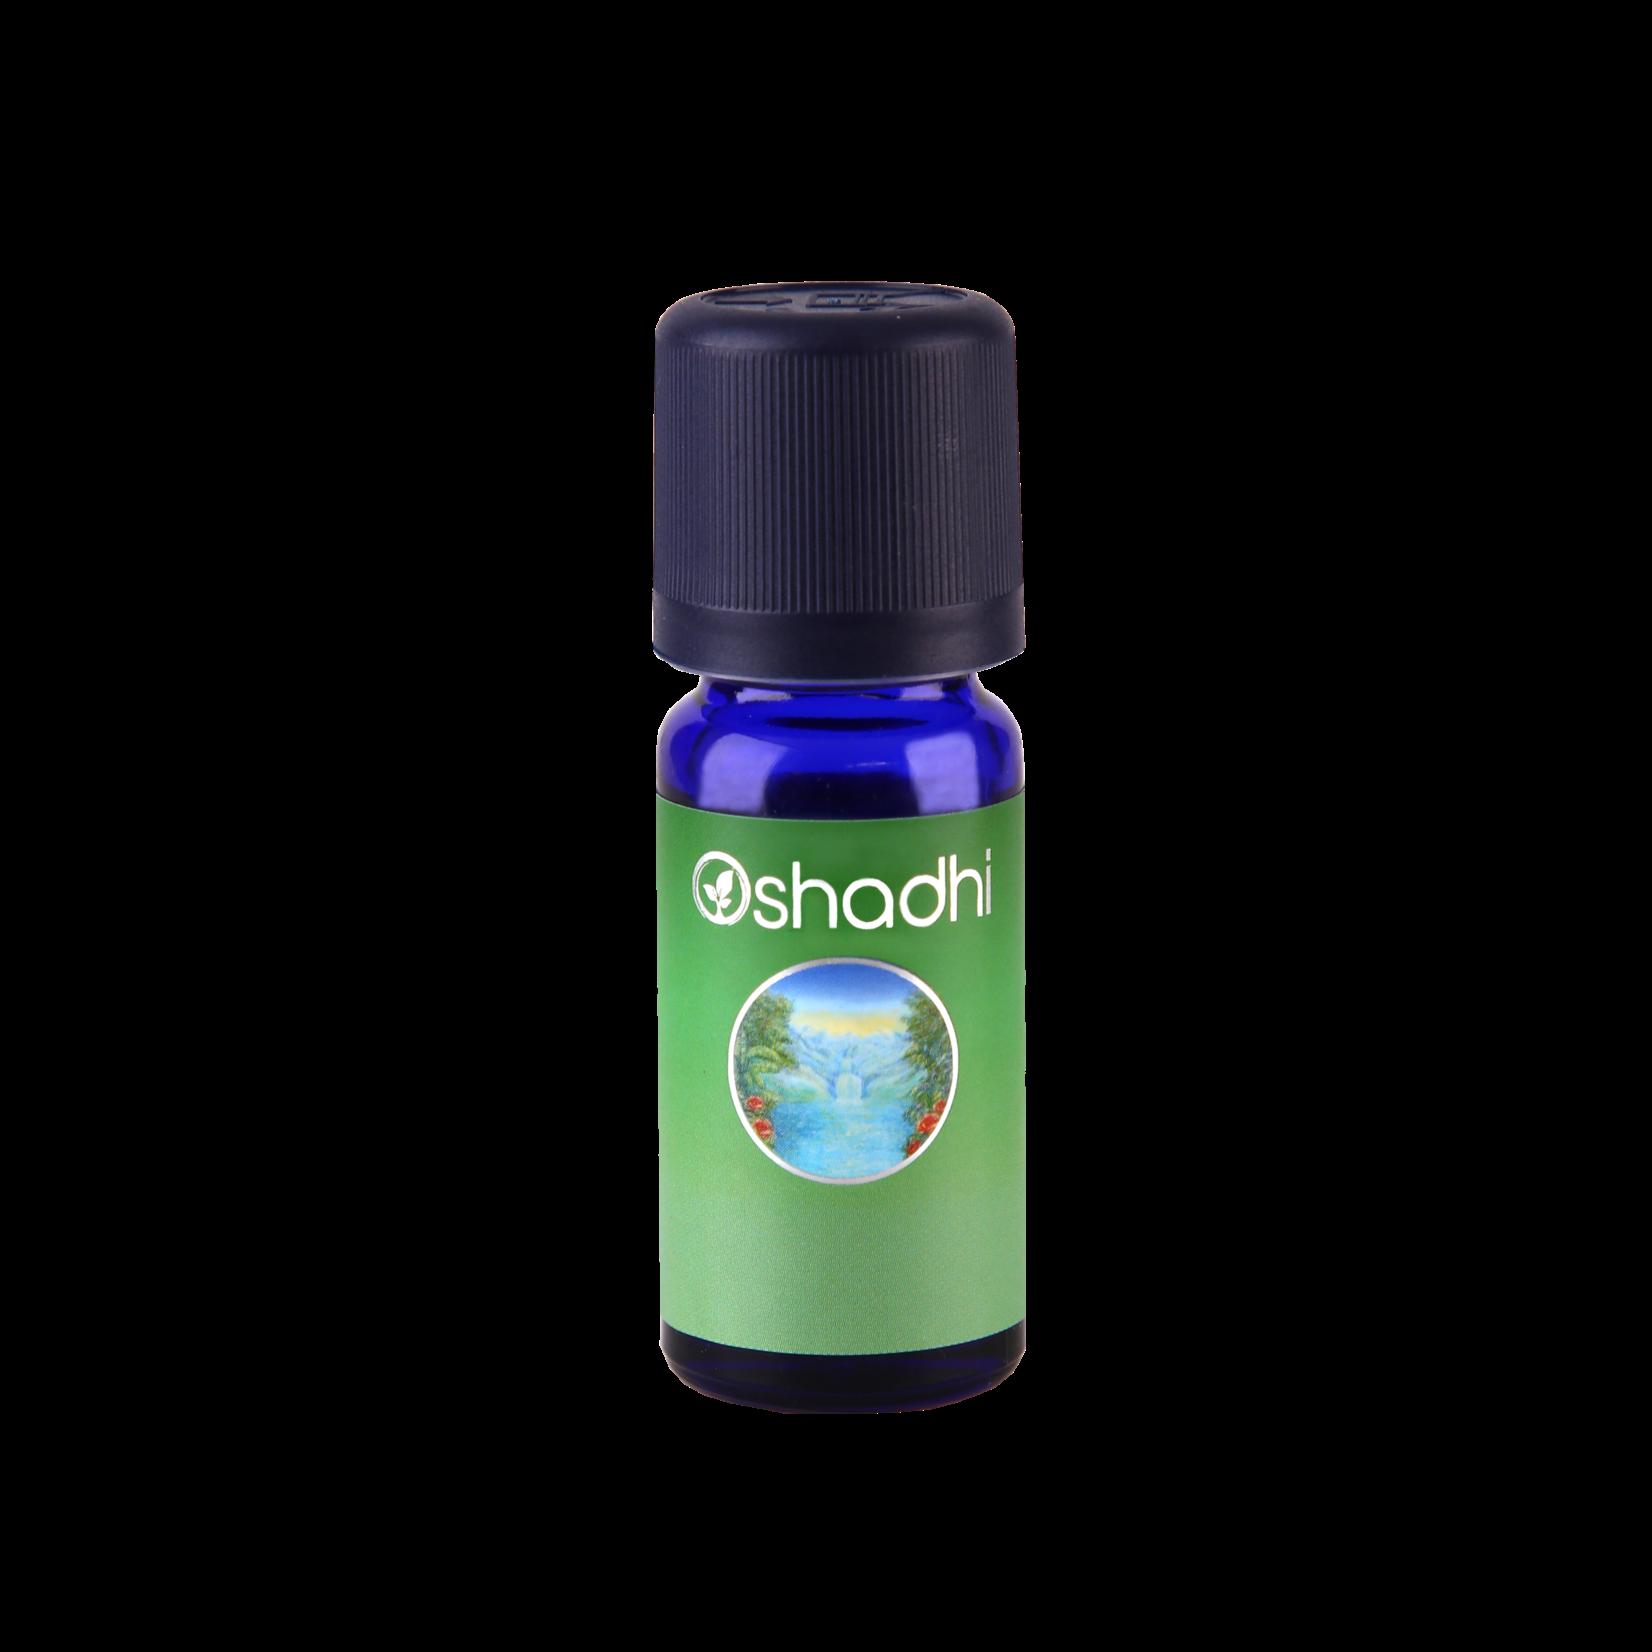 Oshadhi Synergie Harmonie Oshadhi - kalmerend & verwarmend - 10ml